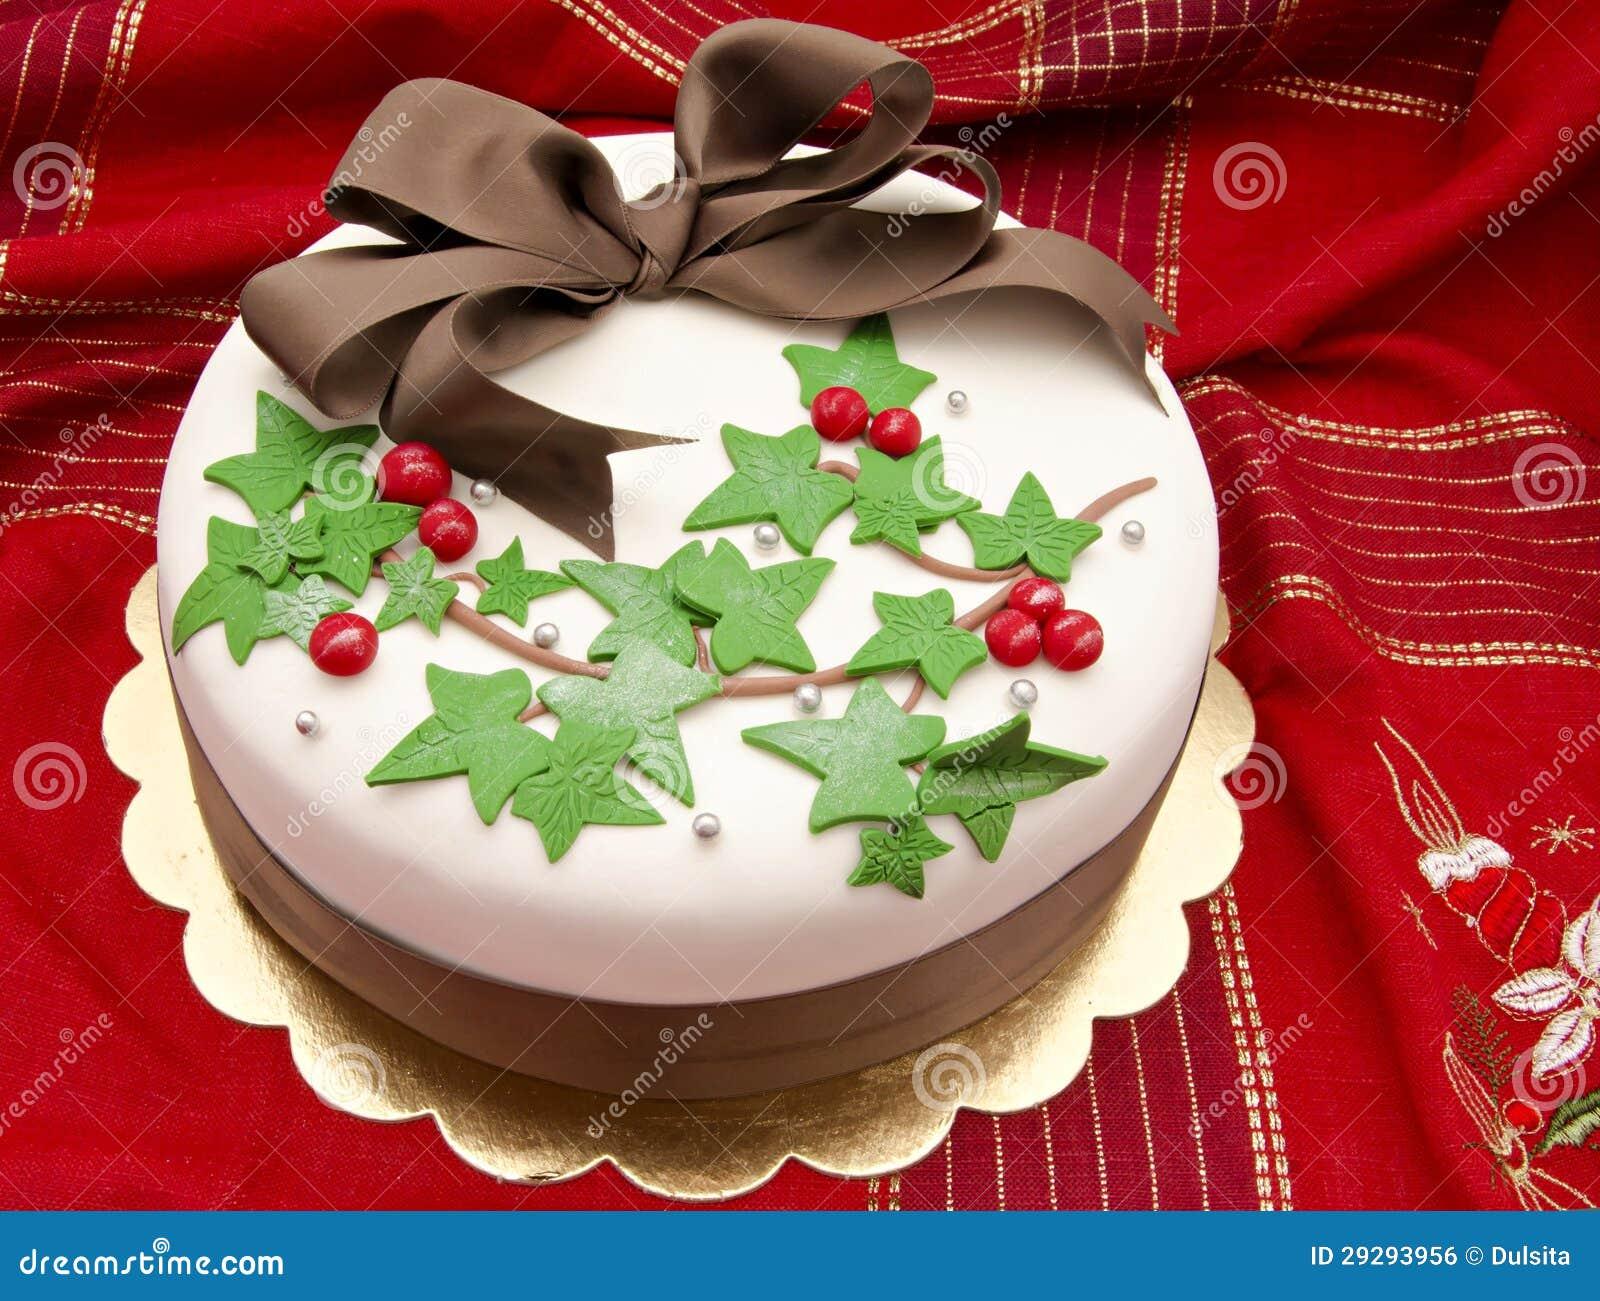 Dolce di natale immagine stock libera da diritti - Decorazioni natalizie per torte ...